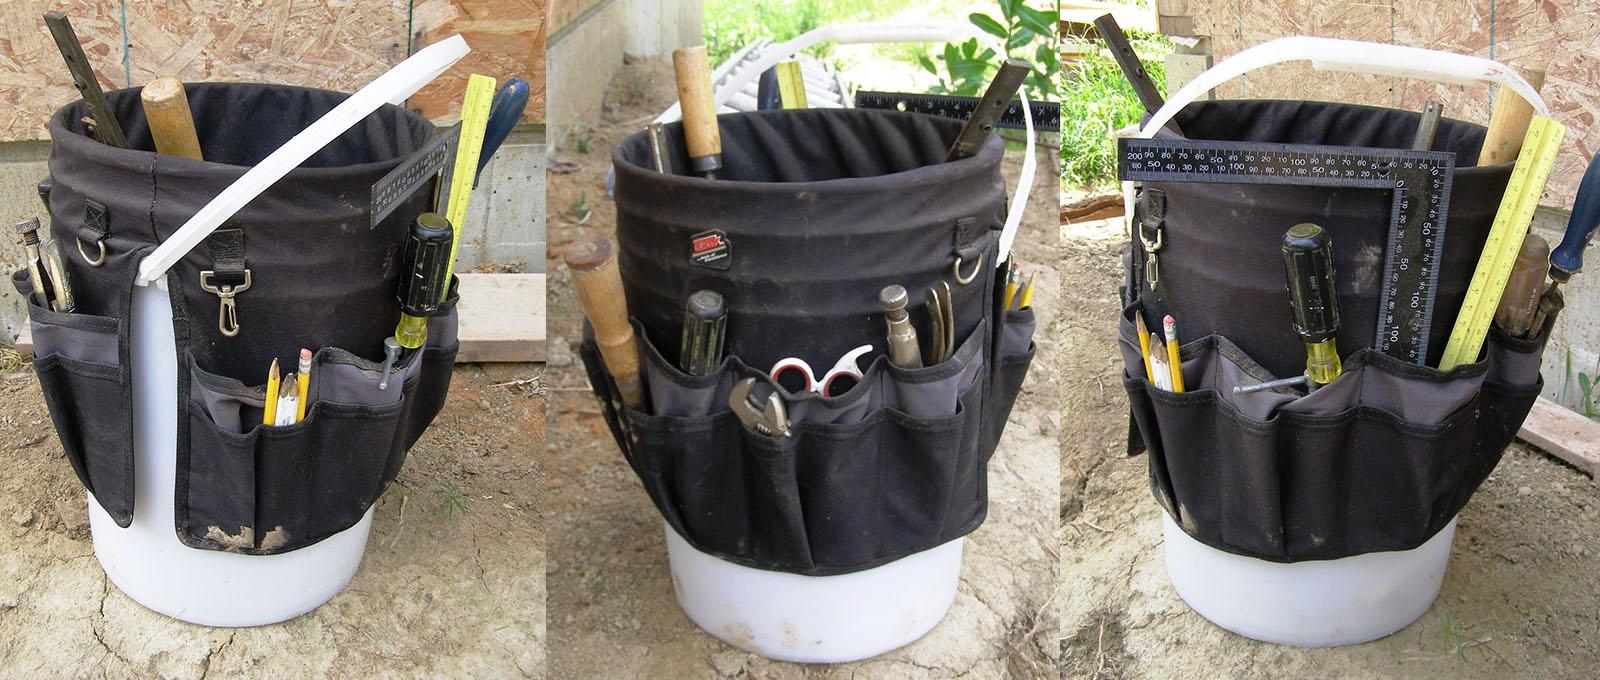 5 Gallon Bucket Tool Organizers | Five Gallon Ideas